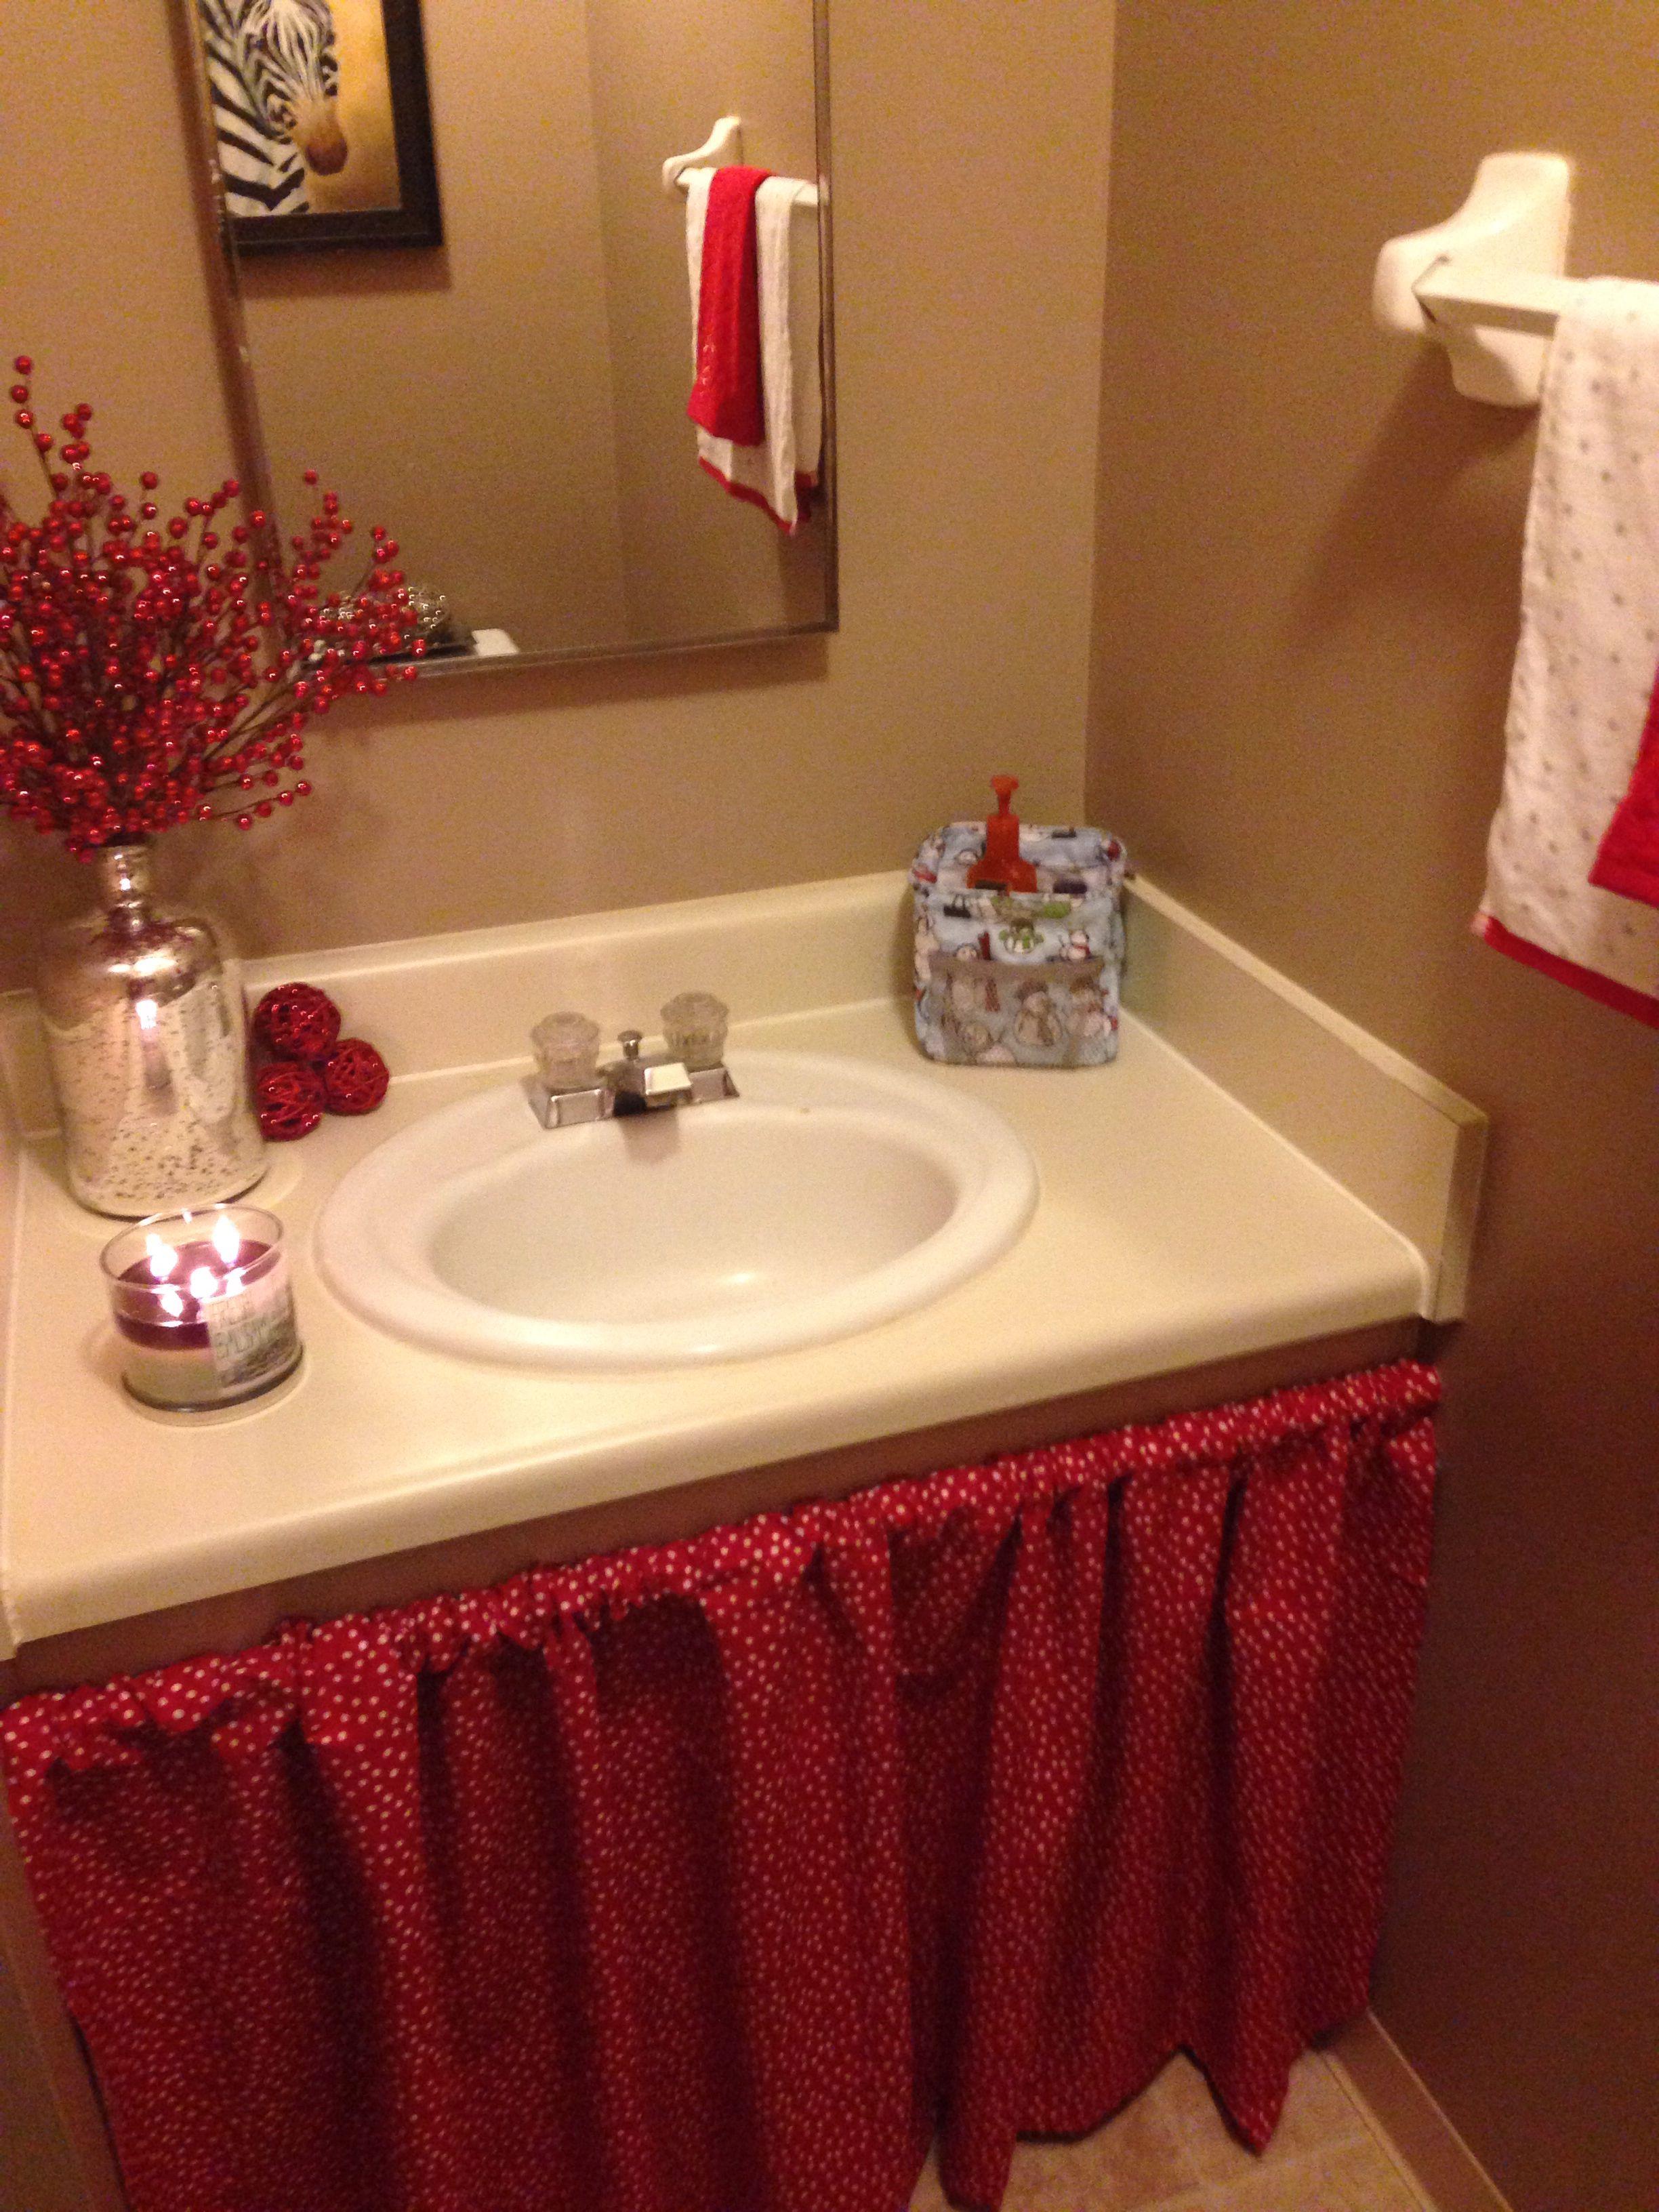 DIY: Bathroom sink skirt | Crafts and Ideas! | Pinterest ...